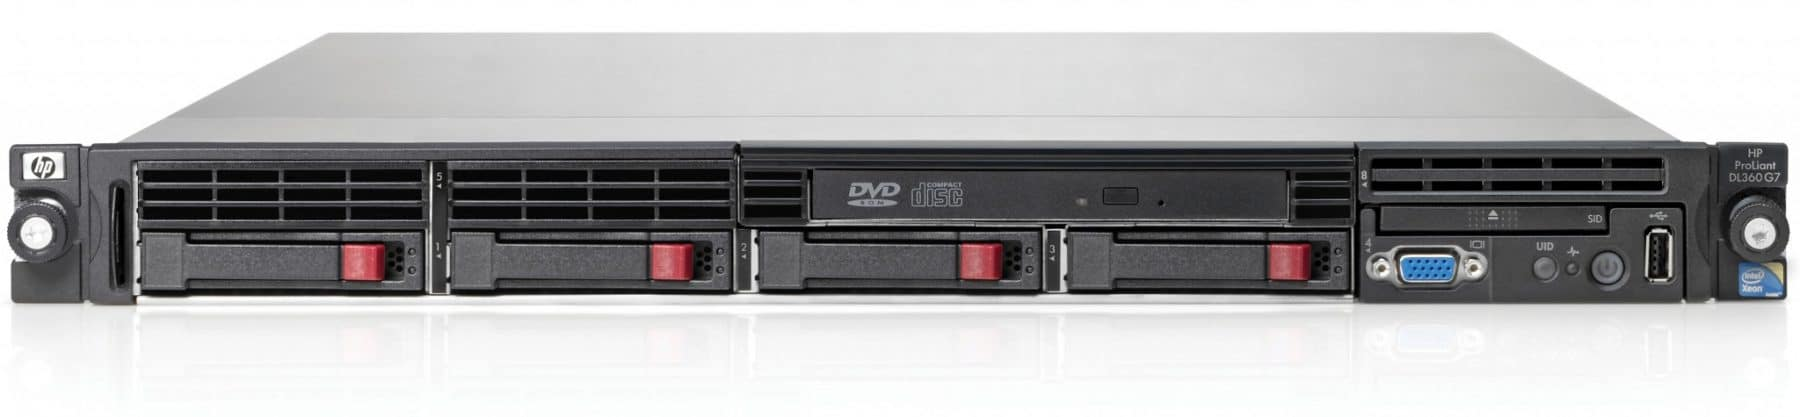 HP-Proliant-DL360-G7-Server-Front-View-1-6-1-2-2-3-1-3-1-1.jpg